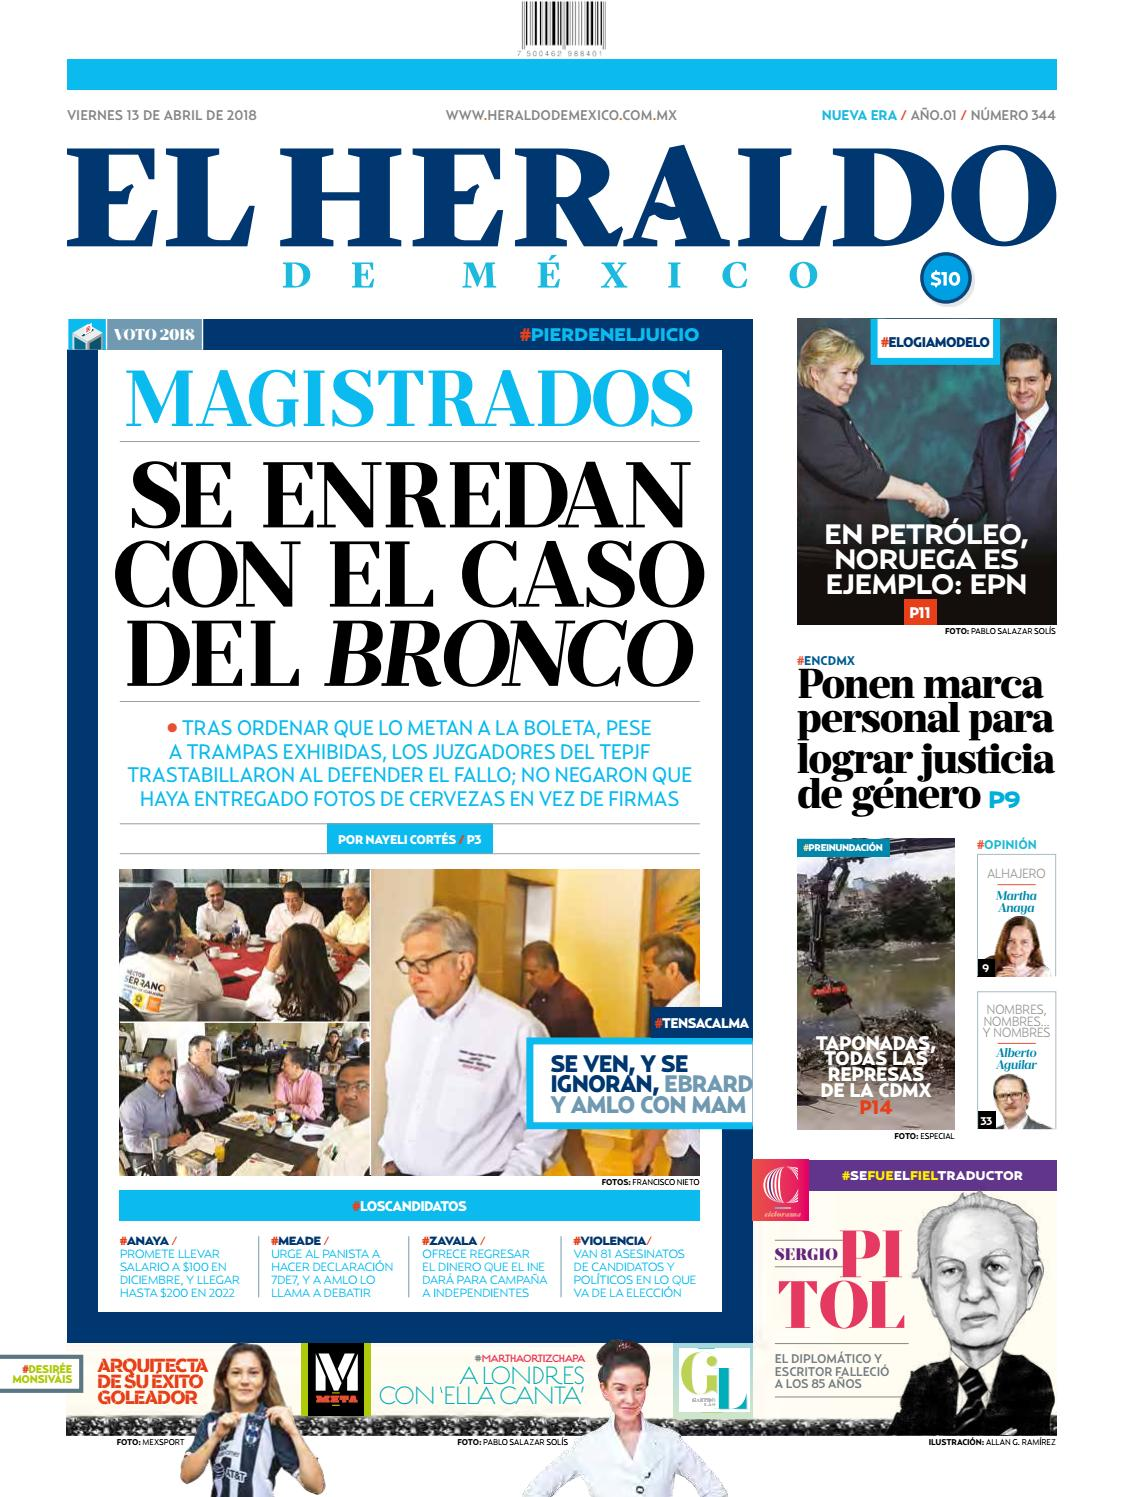 13 de abril de 2018 by El Heraldo de México - issuu 8dbf2bc367a0e